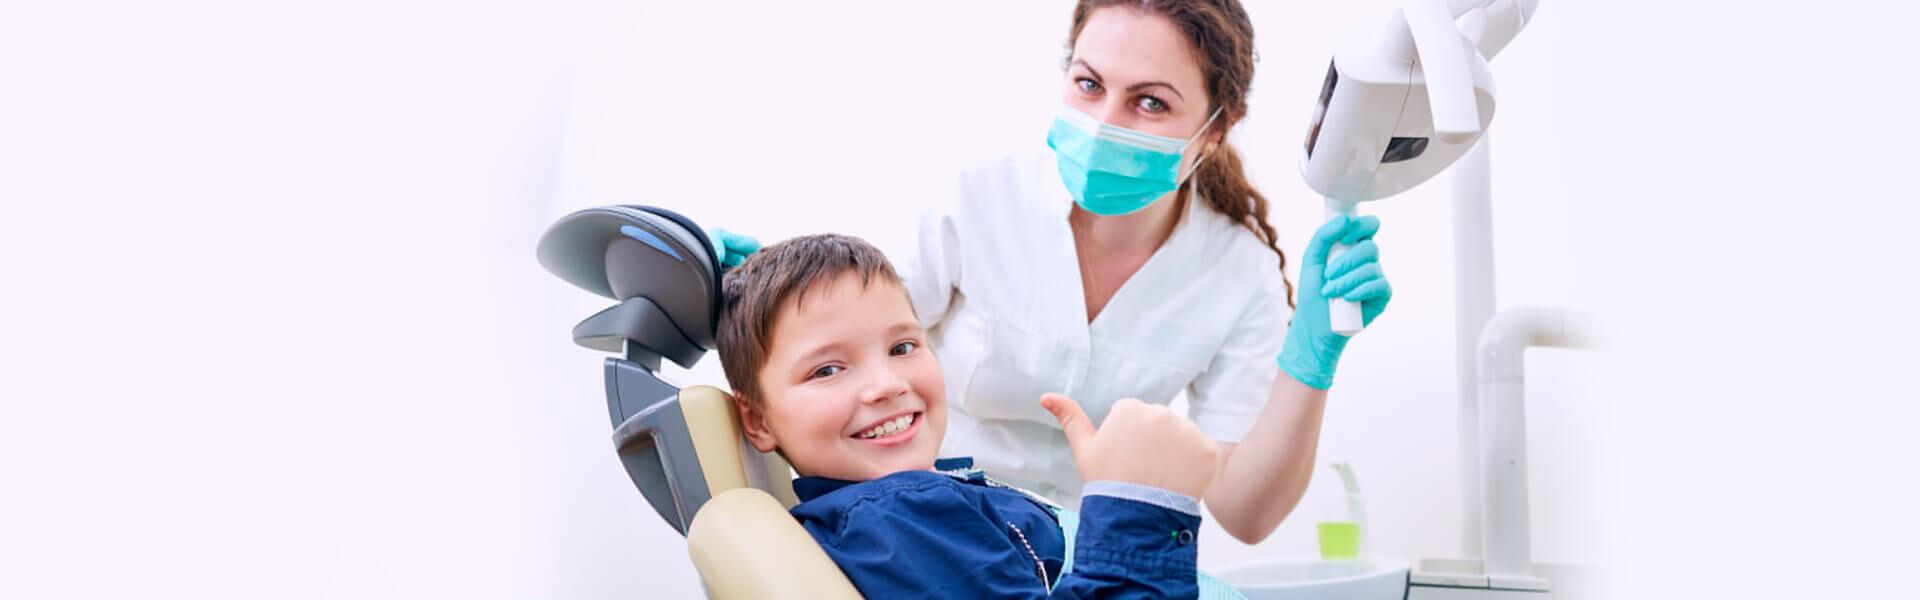 Children's Dentistry in Lexington, MA